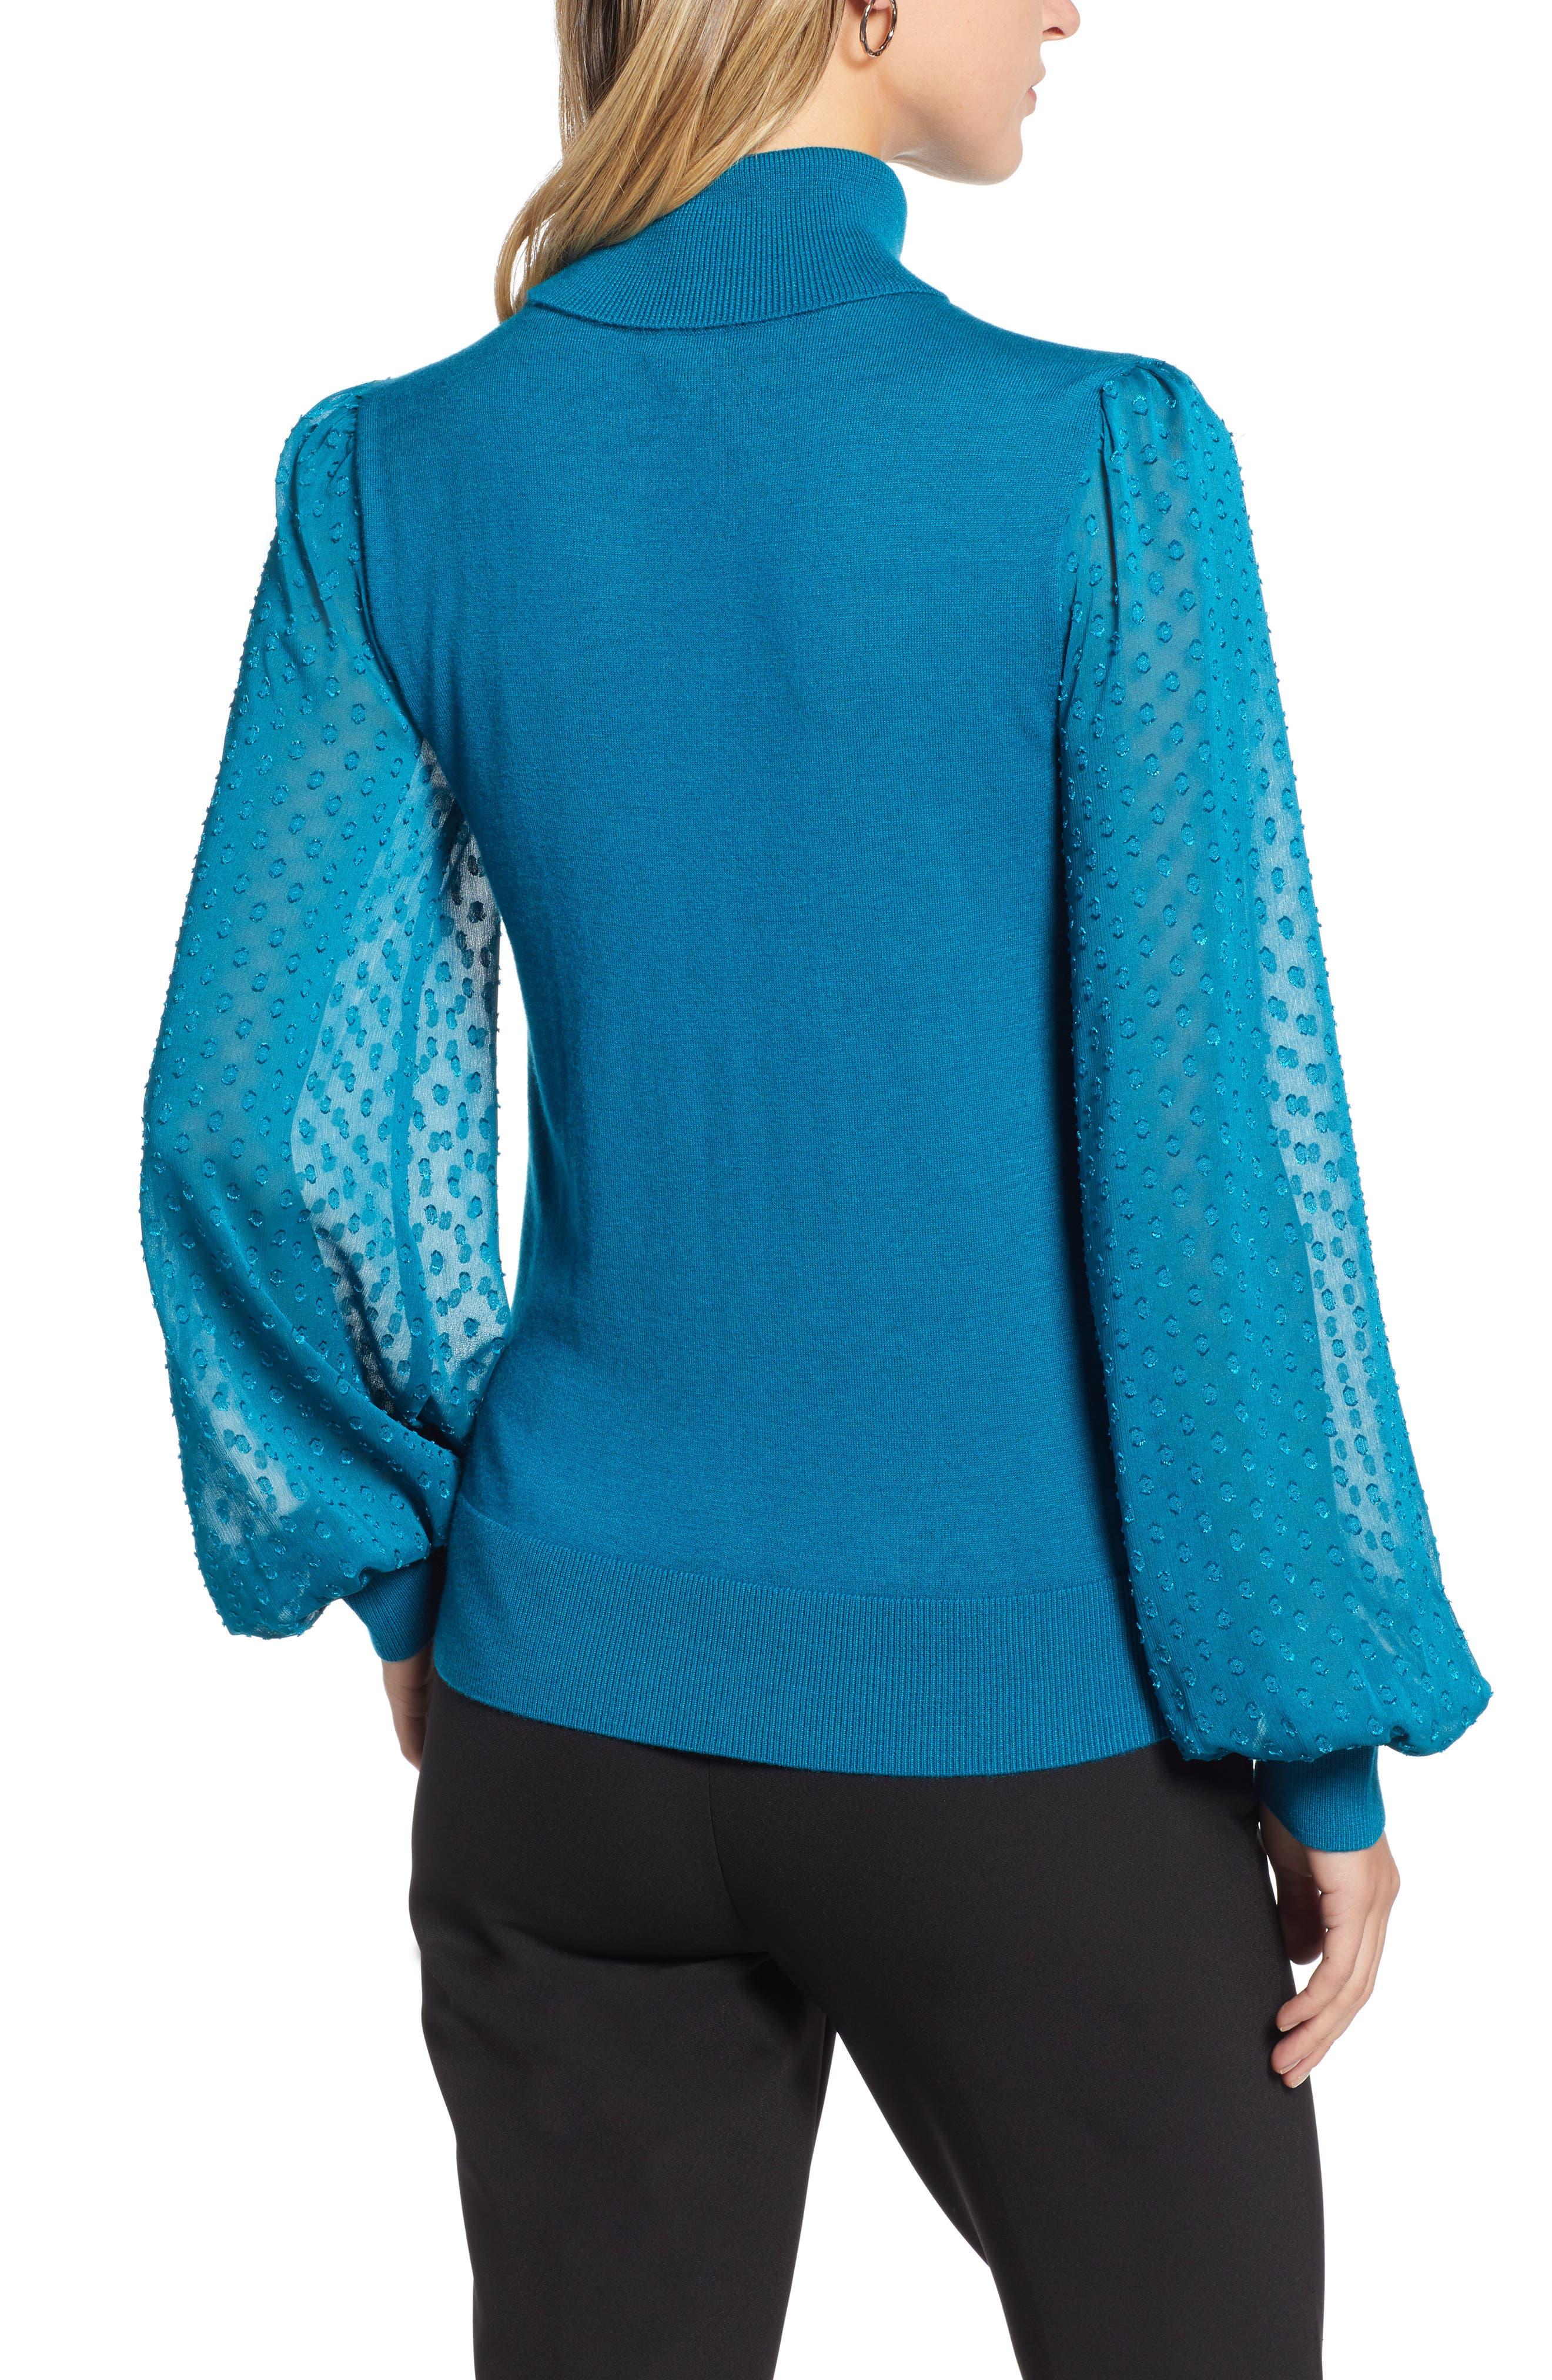 Sheer Sleeve Turtleneck Sweater,                             Alternate thumbnail 2, color,                             449